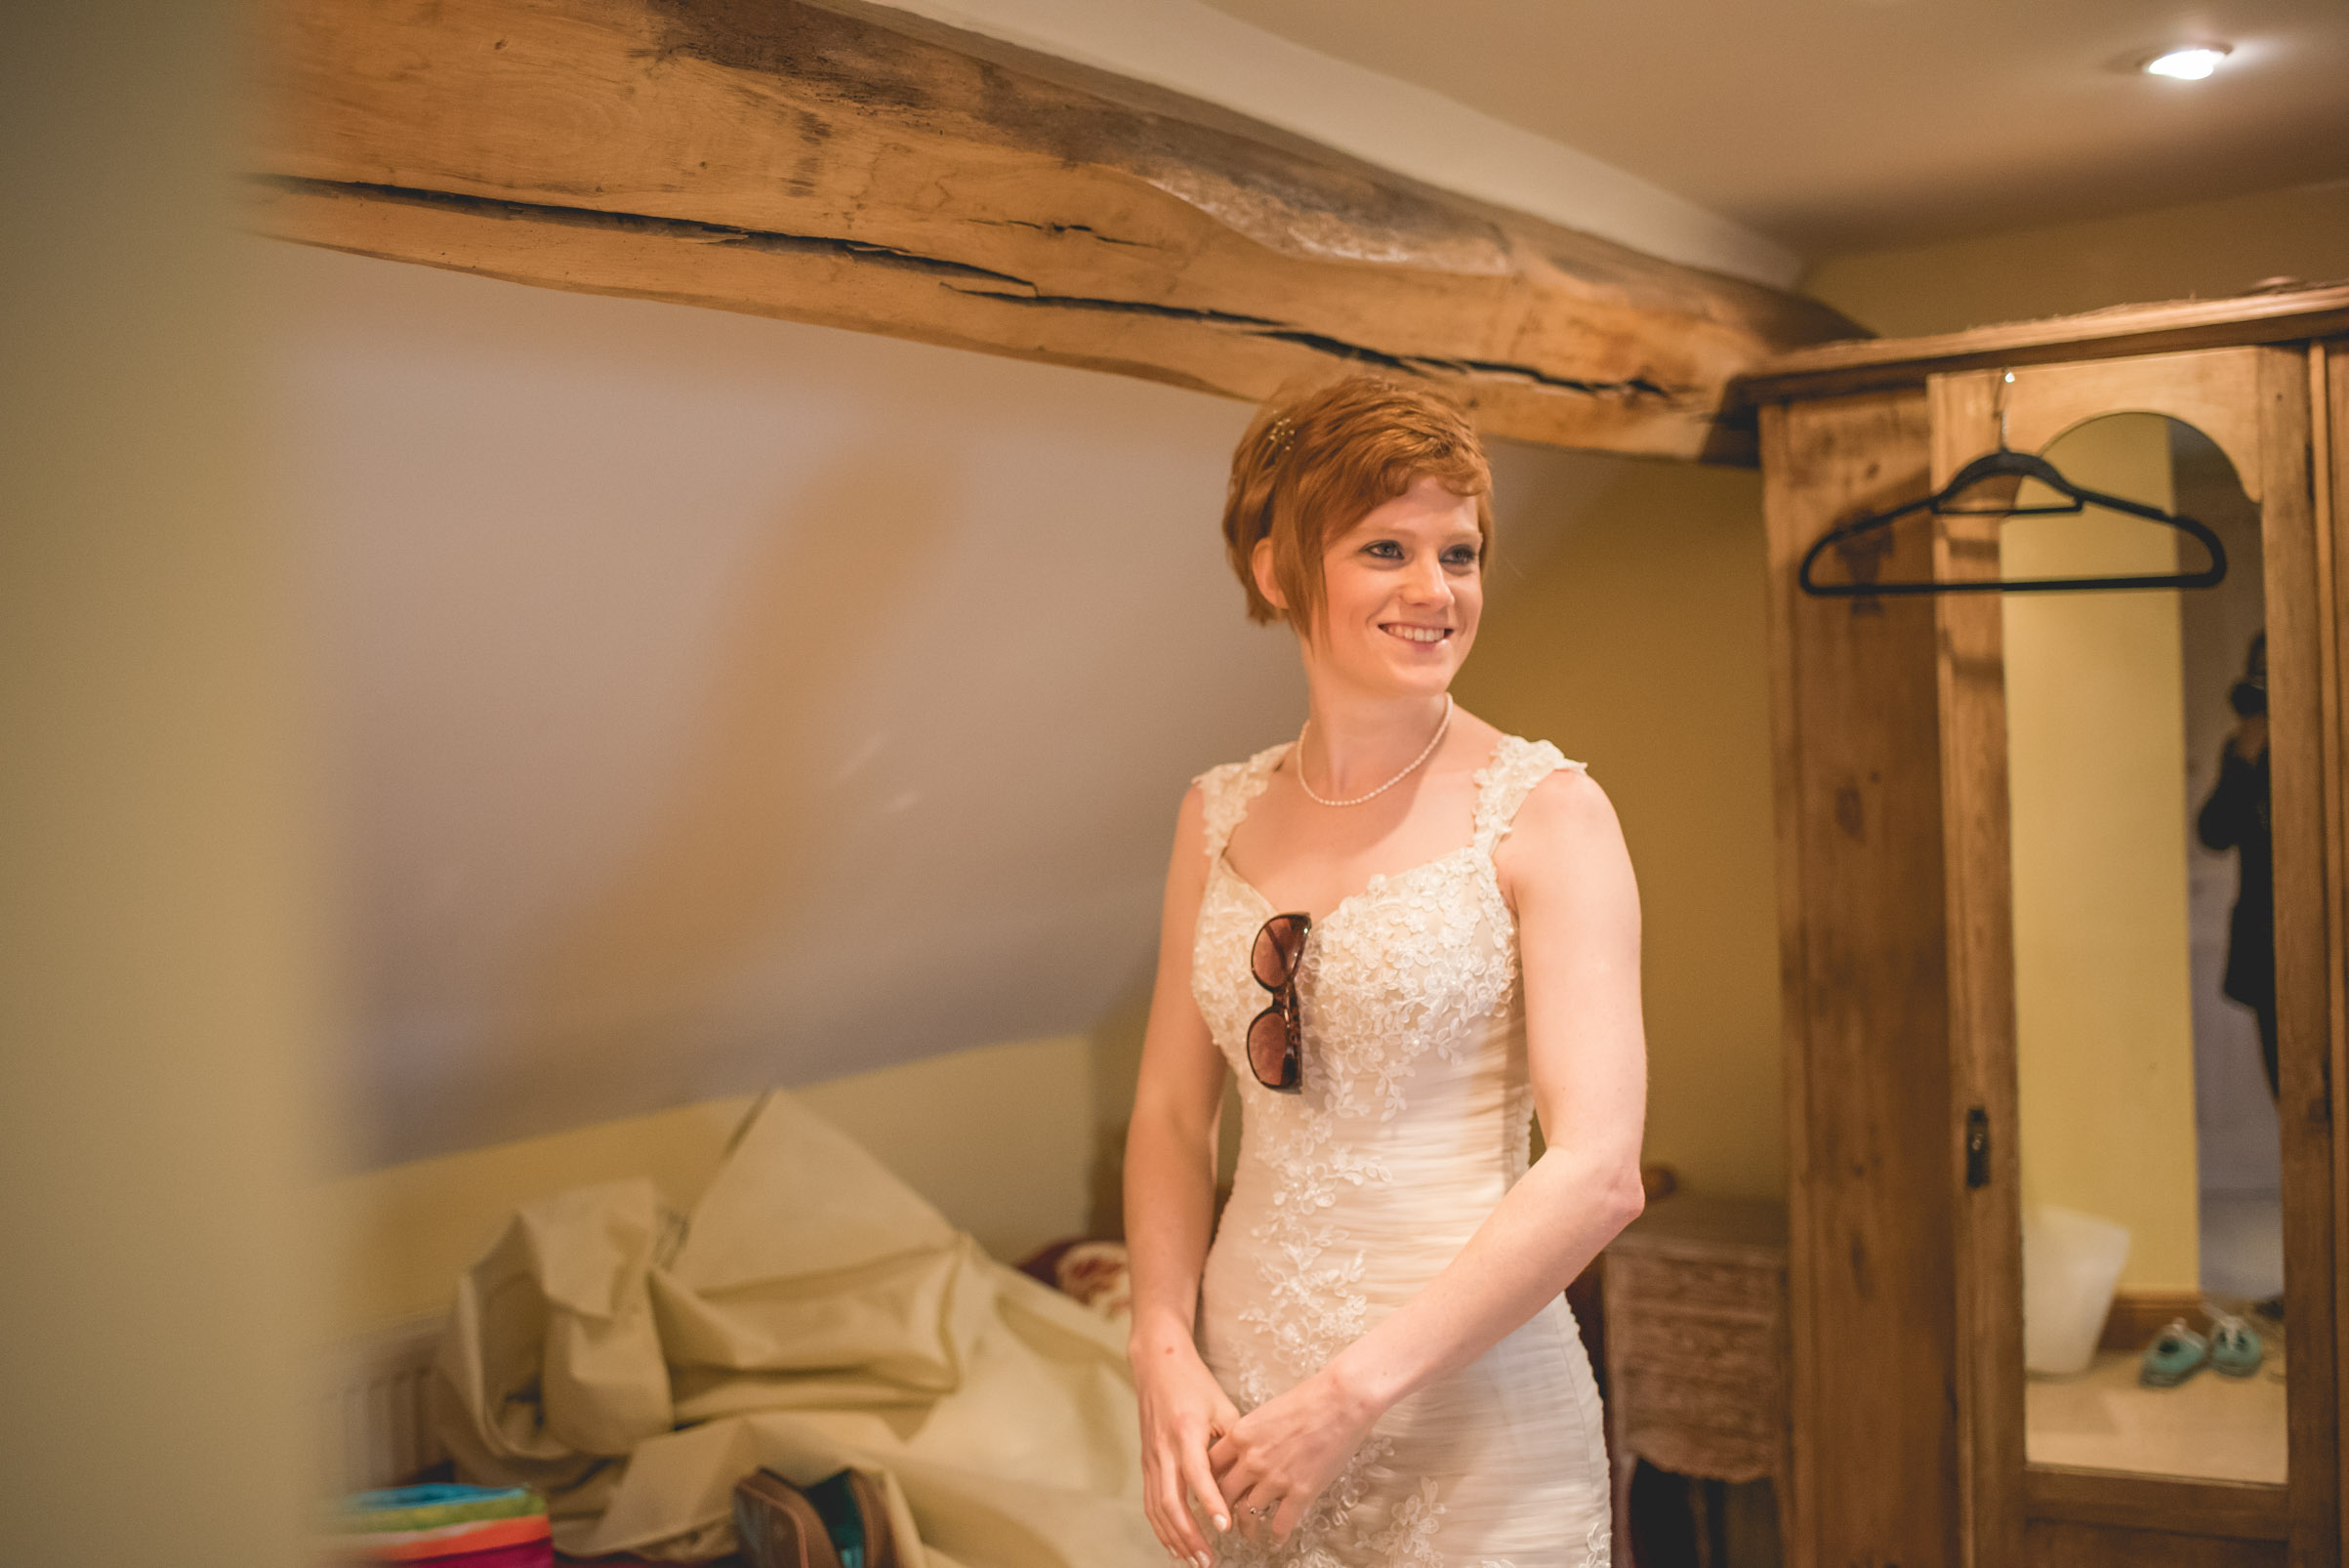 Peak+district+farm+wedding+lower+damgate+photographer-67.jpg